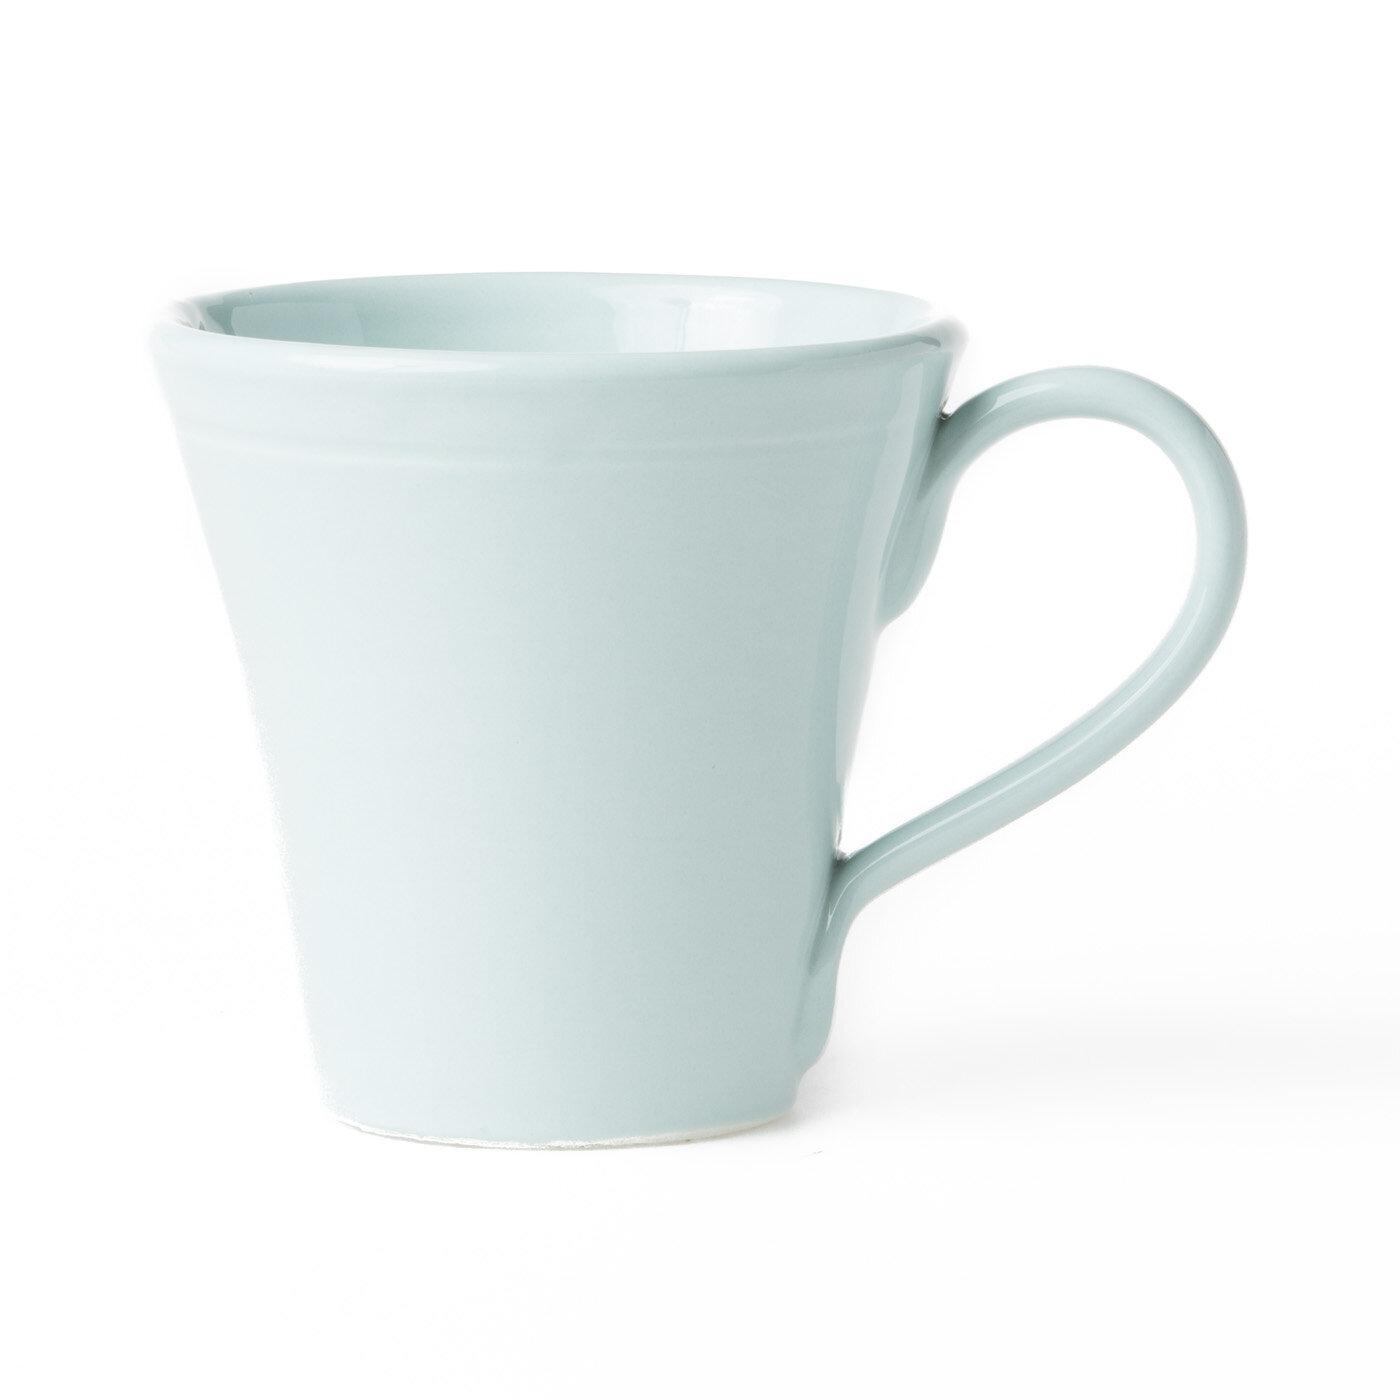 Viva By Vietri Fresh Coffee Mug Reviews Wayfair